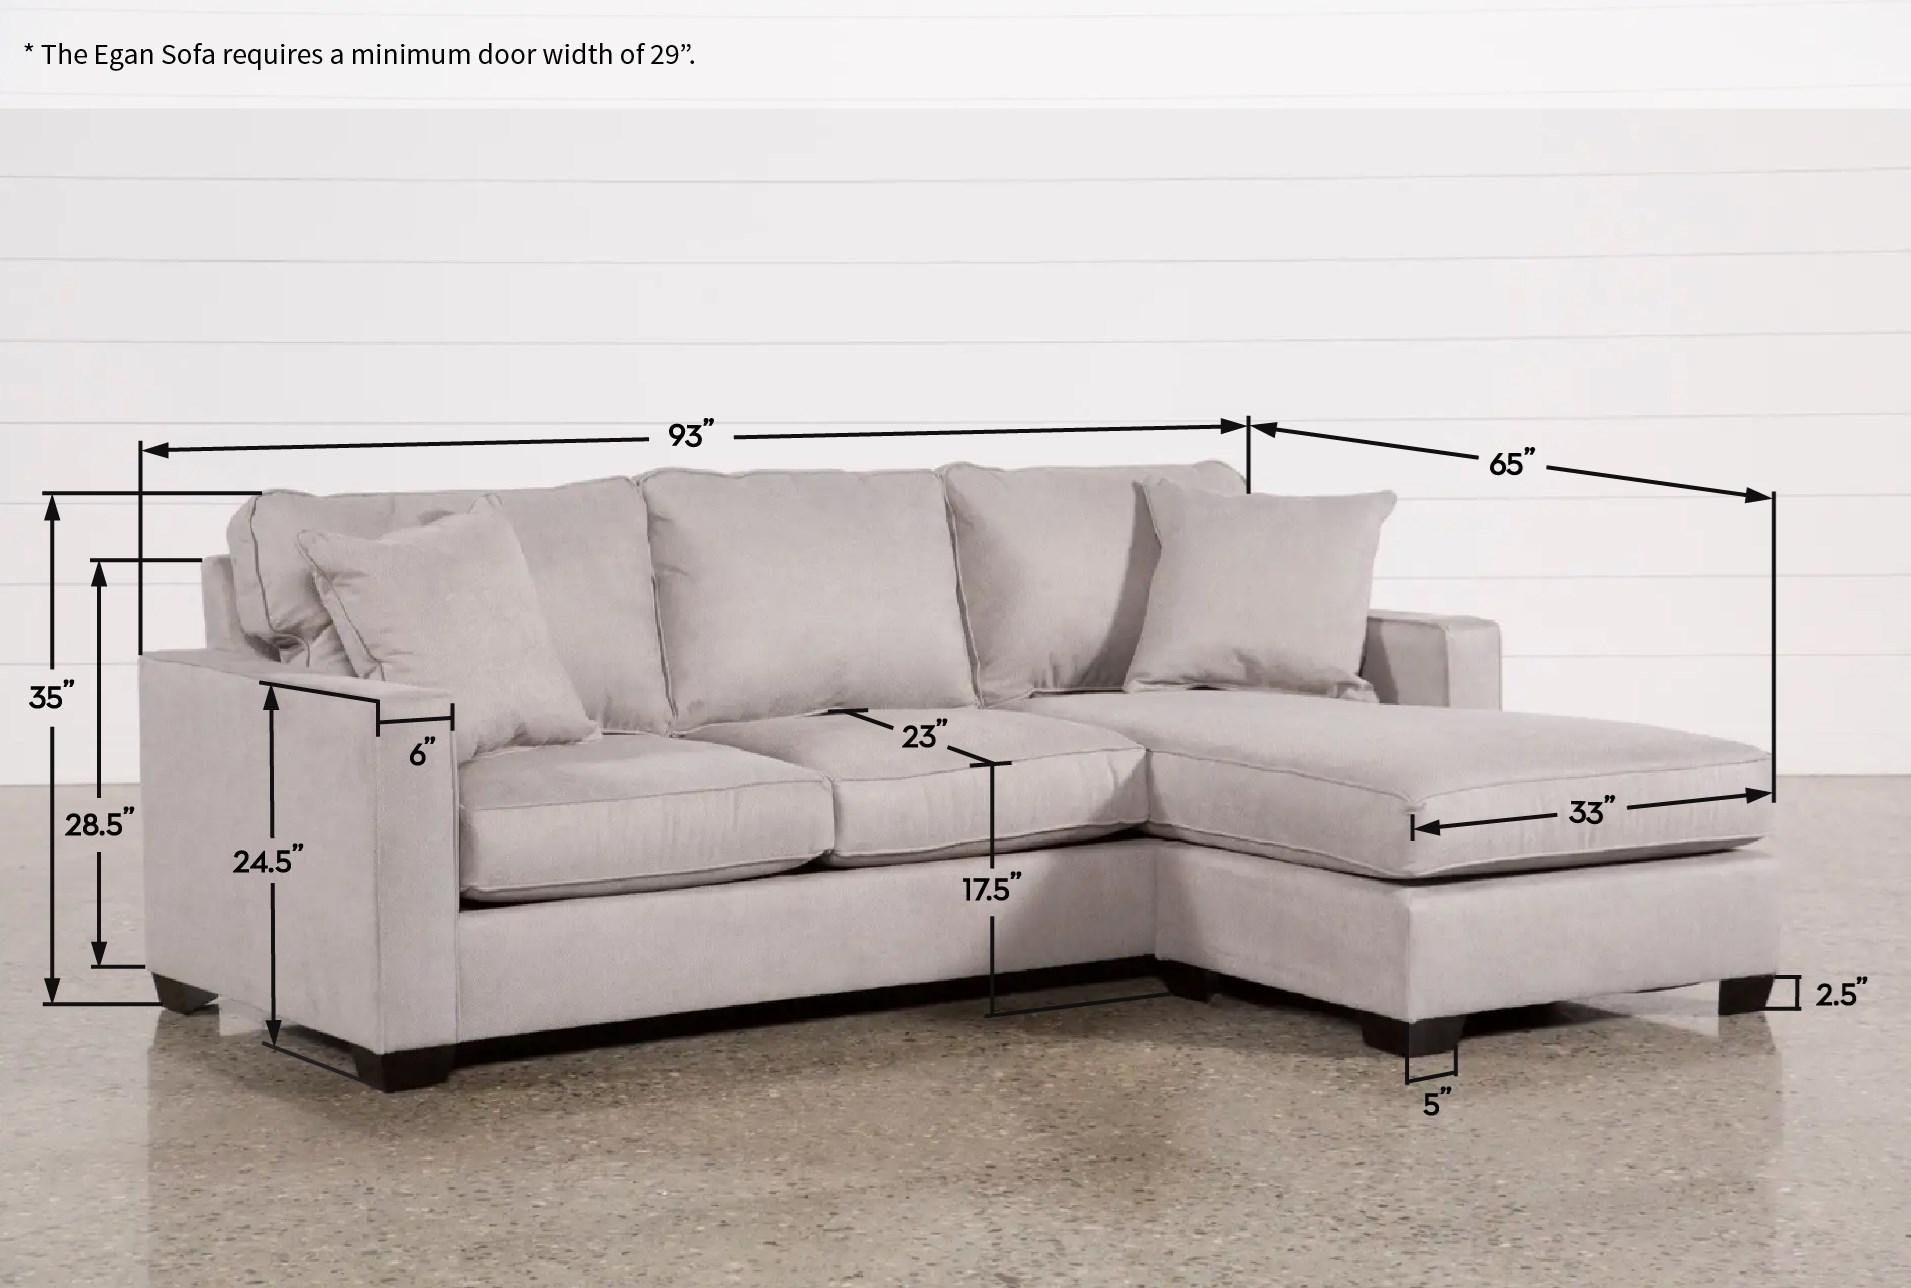 Dimensions 93 W X 65 D 37 H